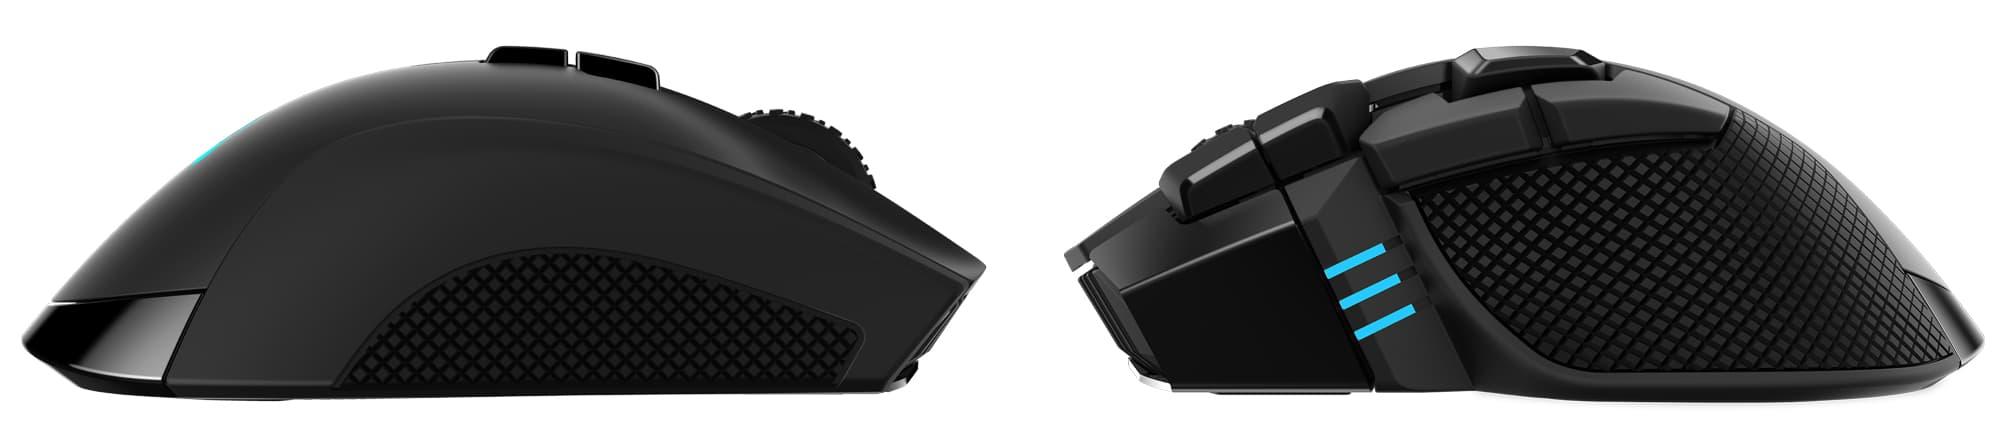 corsair-ironclaw-wireless-2.jpg